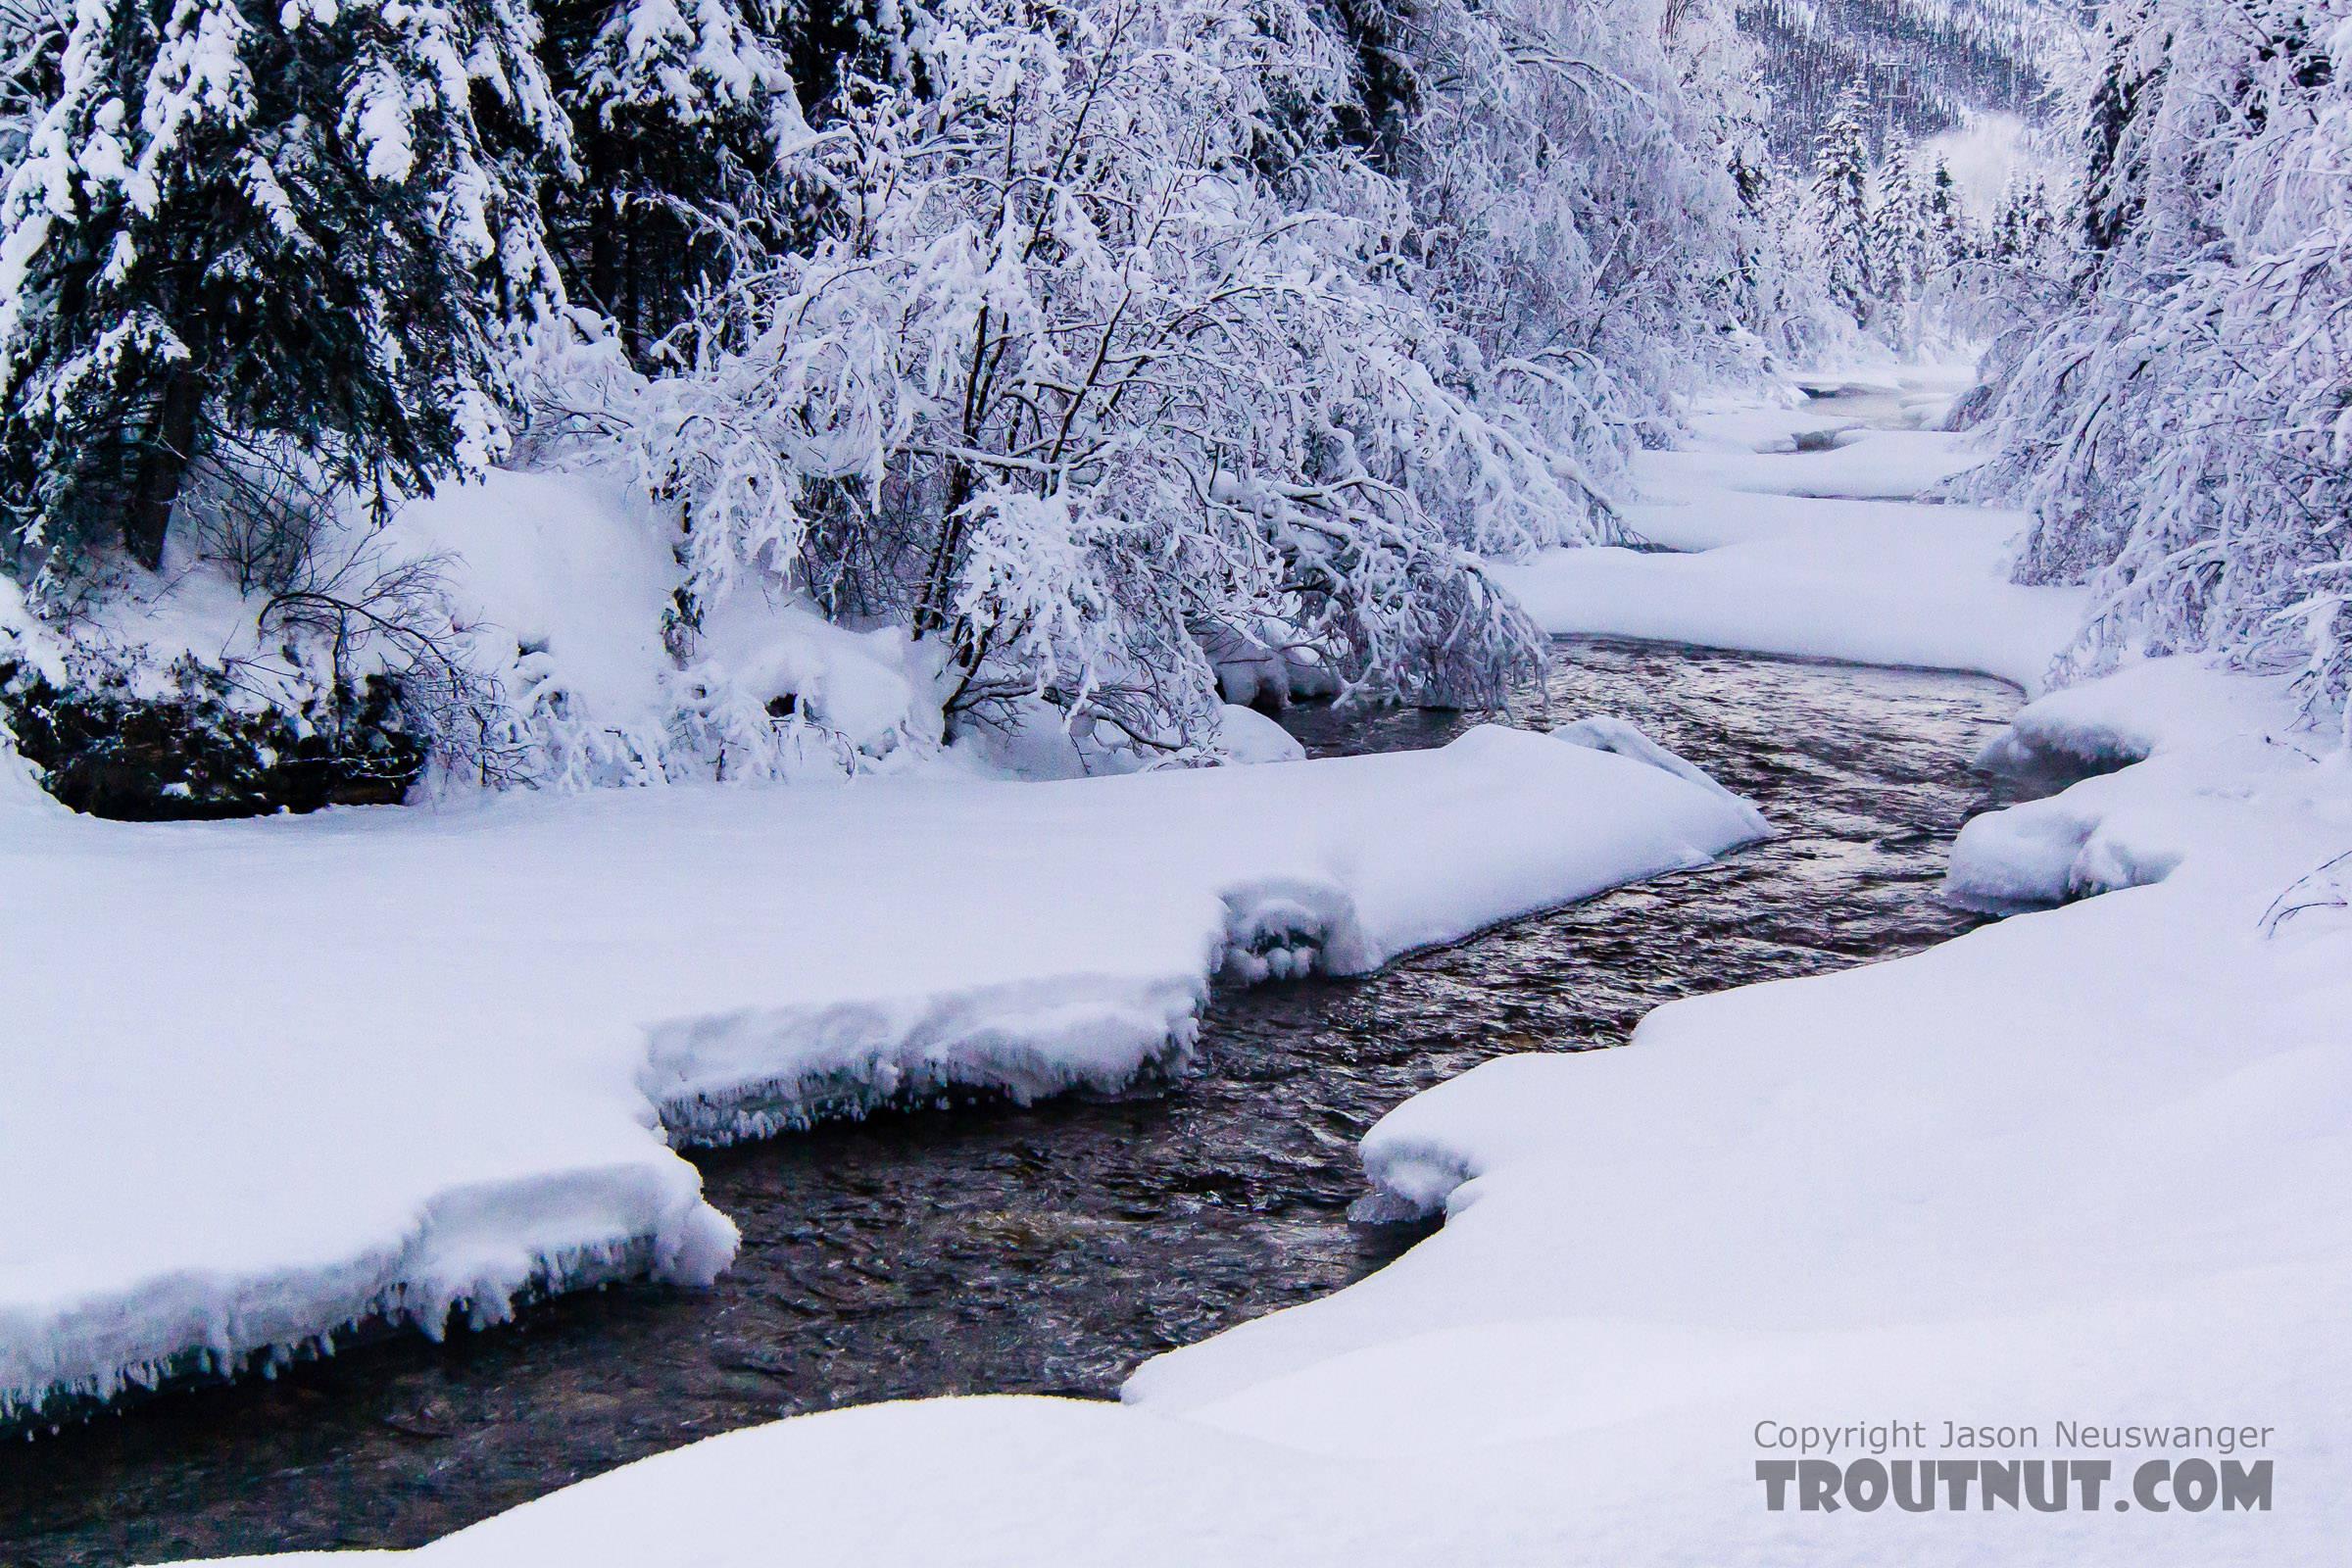 From Mammoth Creek in Alaska.